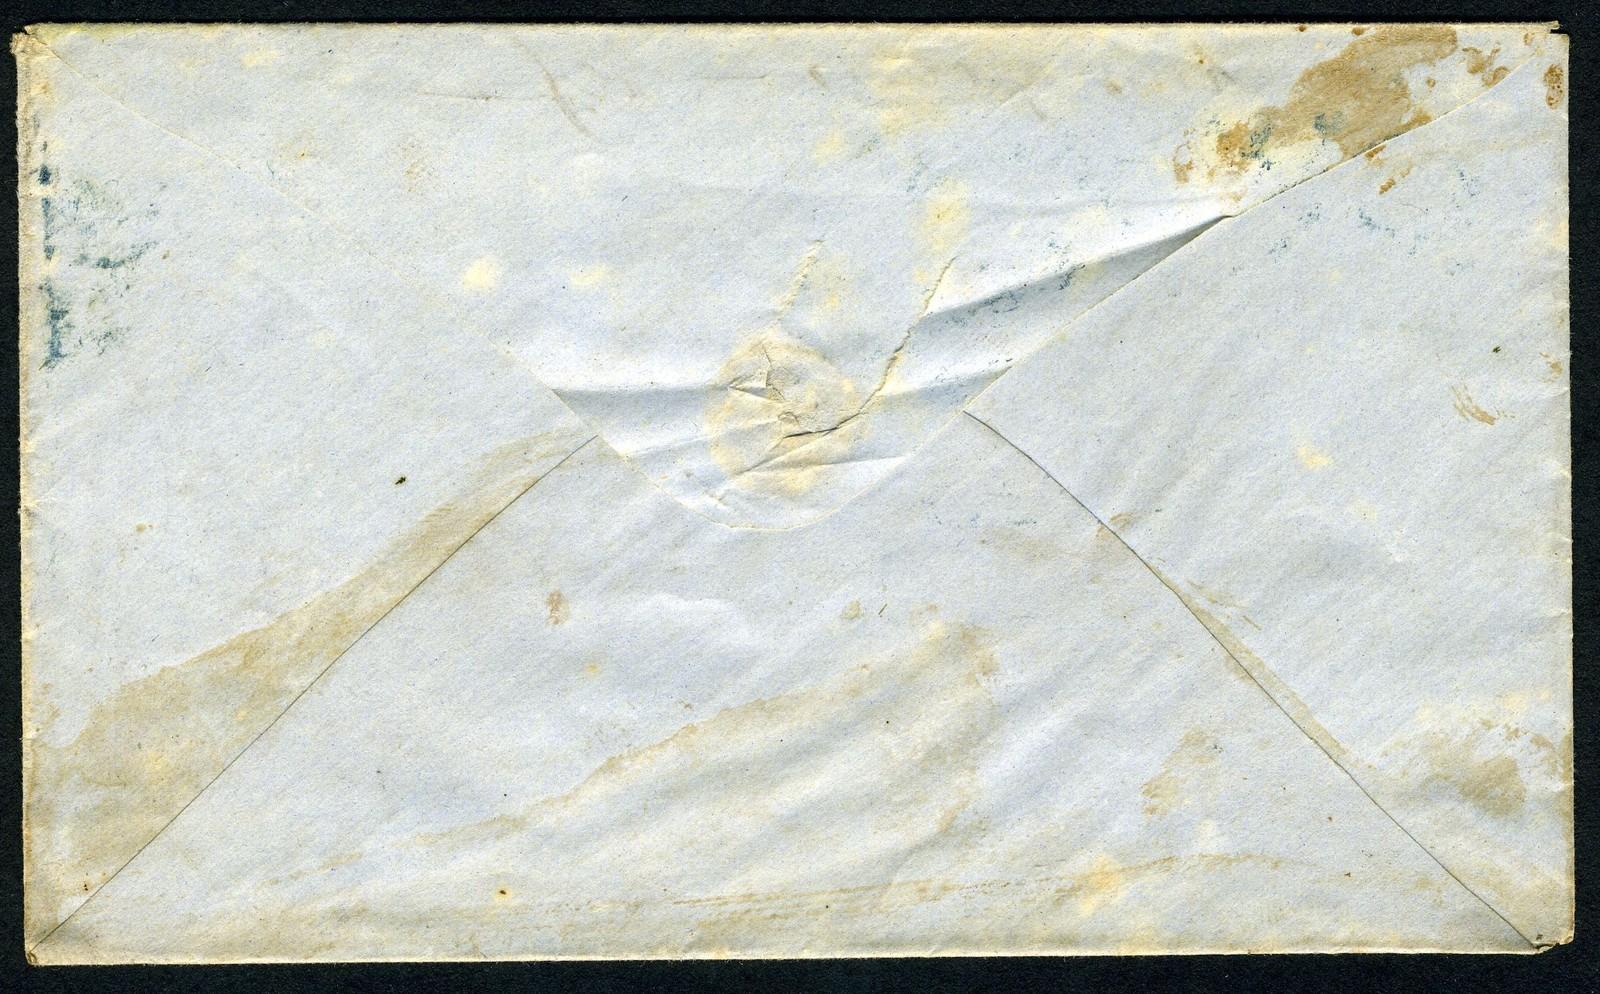 ID 867, Image ID 597